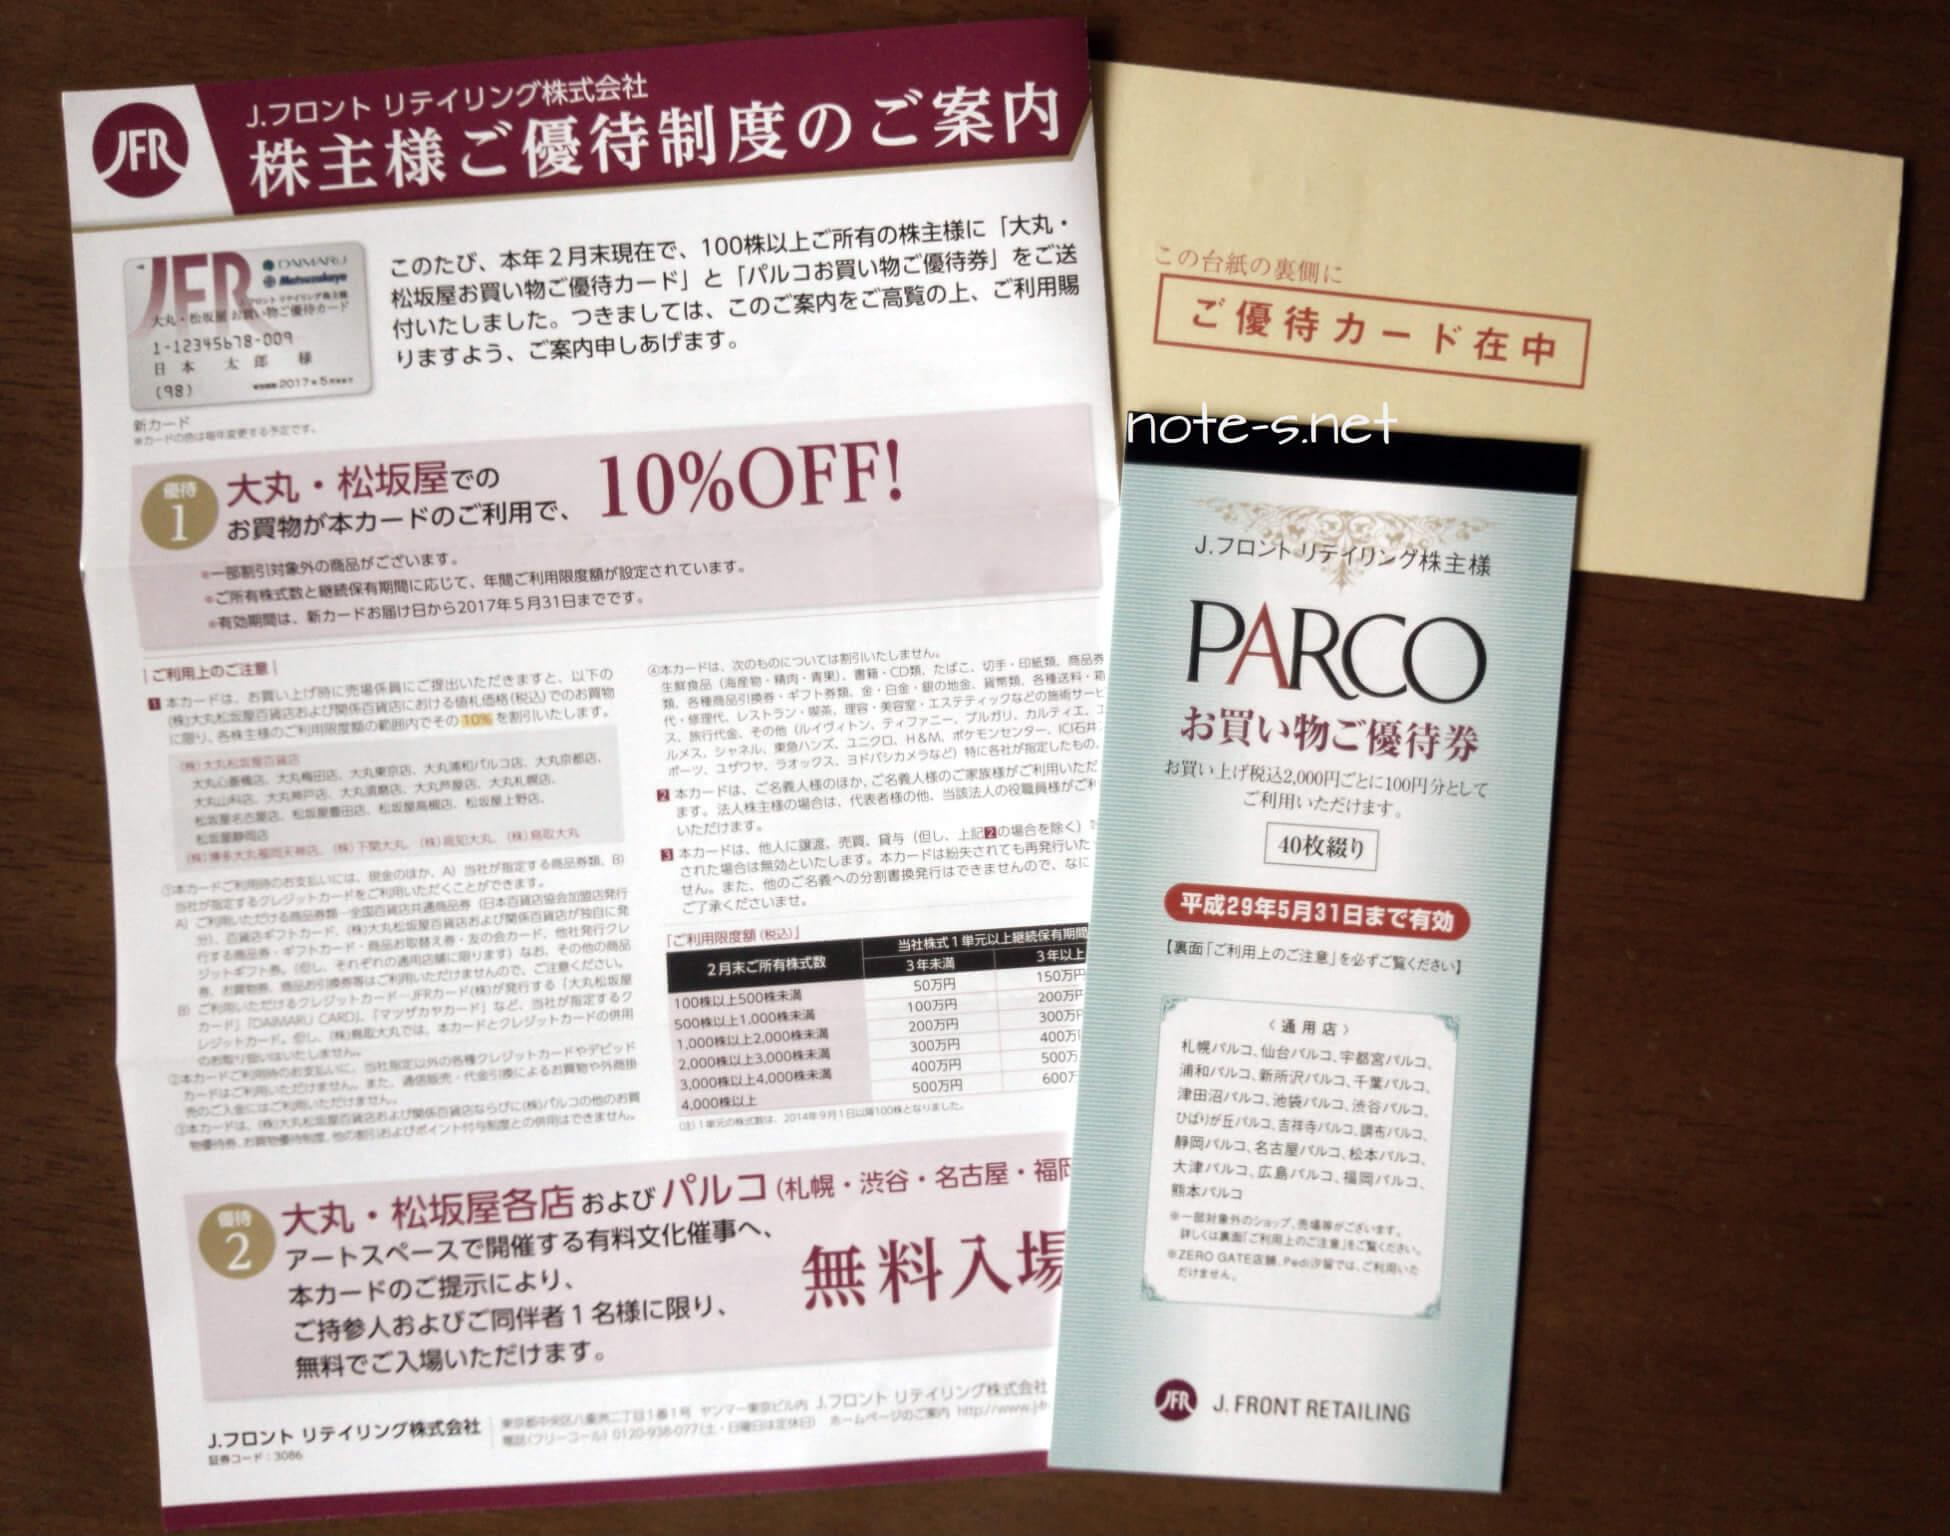 Jフロント(大丸松坂屋)株主優待はギフト購入におすすめ!転売は不向き